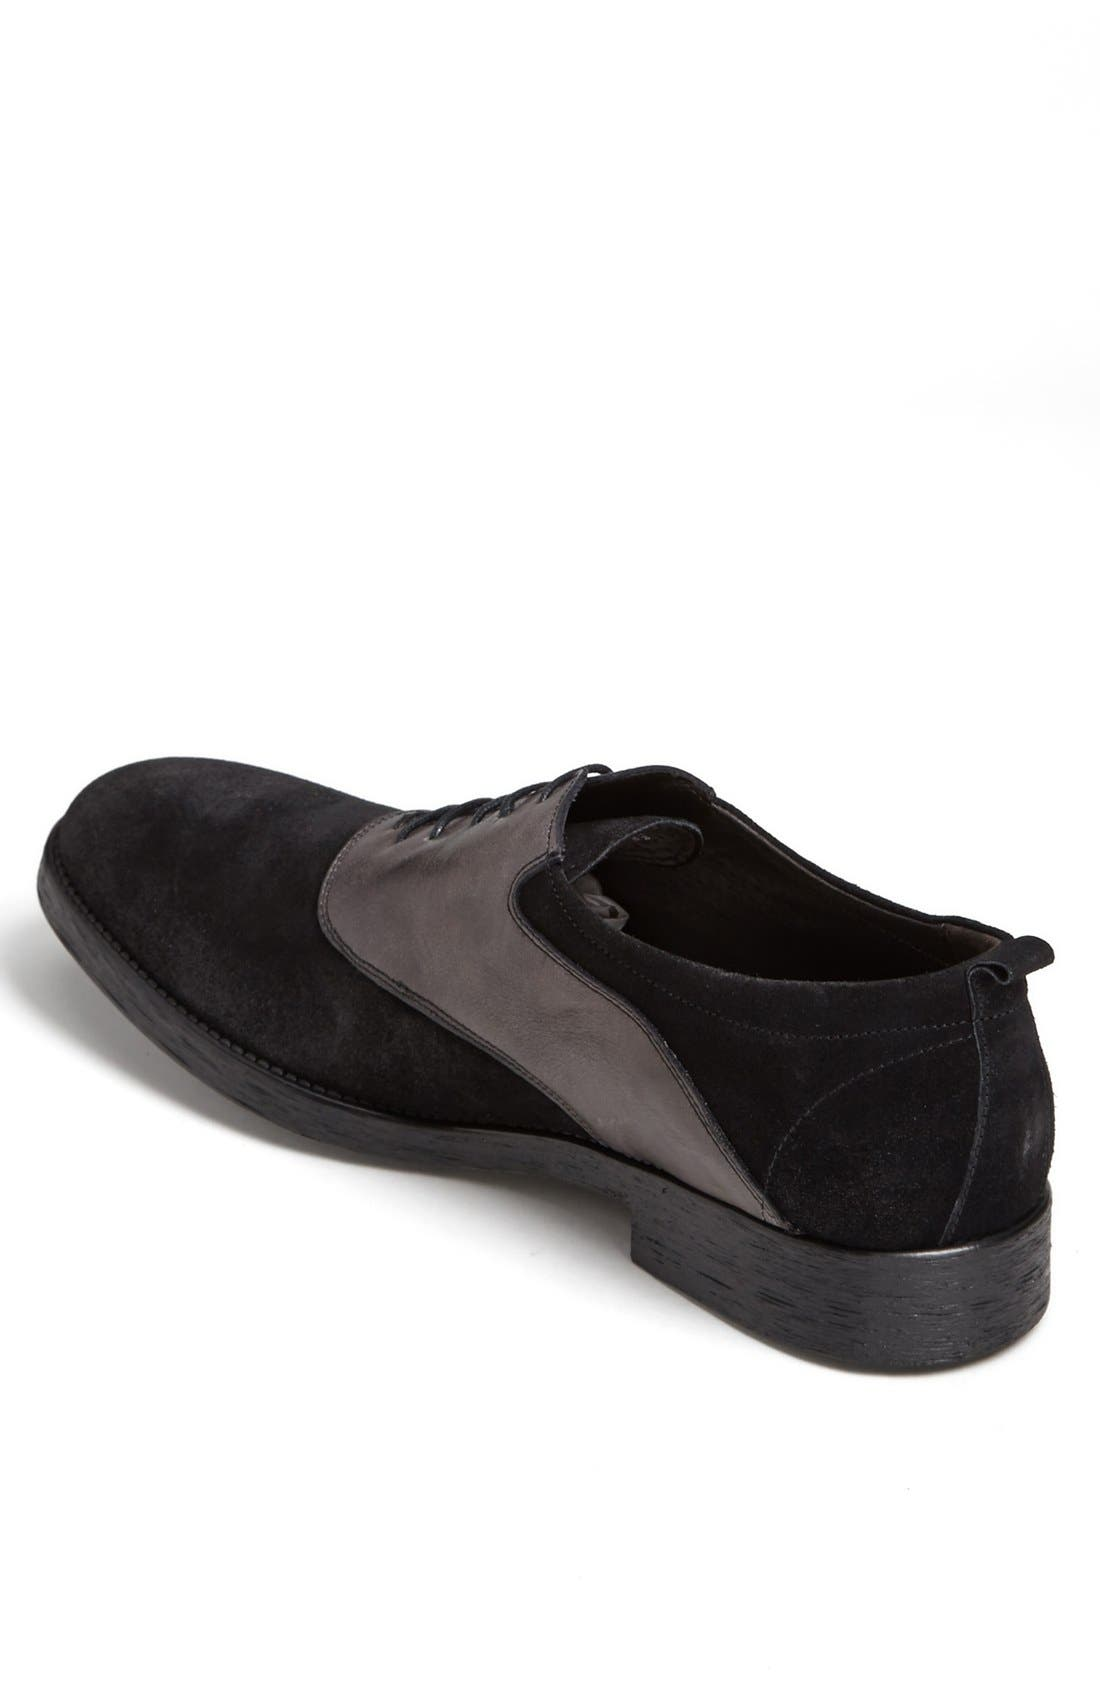 Alternate Image 2  - Wallin & Bros. 'Jacobs' Saddle Shoe